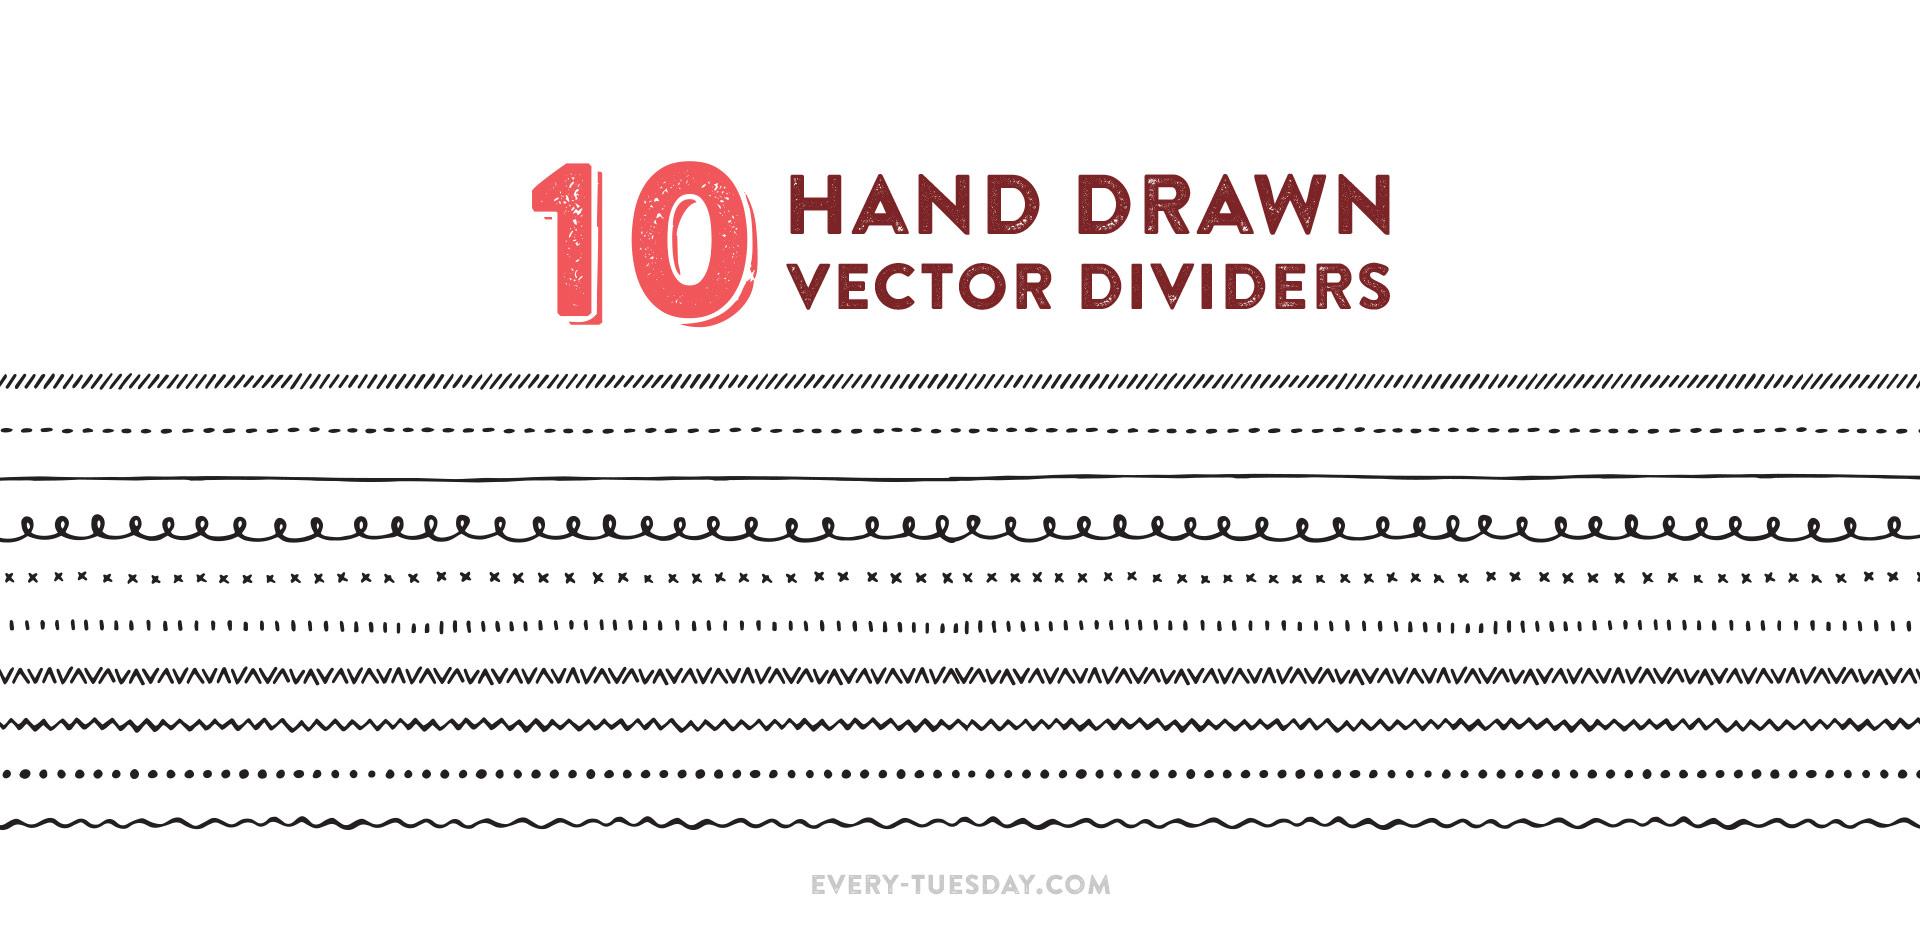 1920x928 Freebie Hand Drawn Vector Dividers